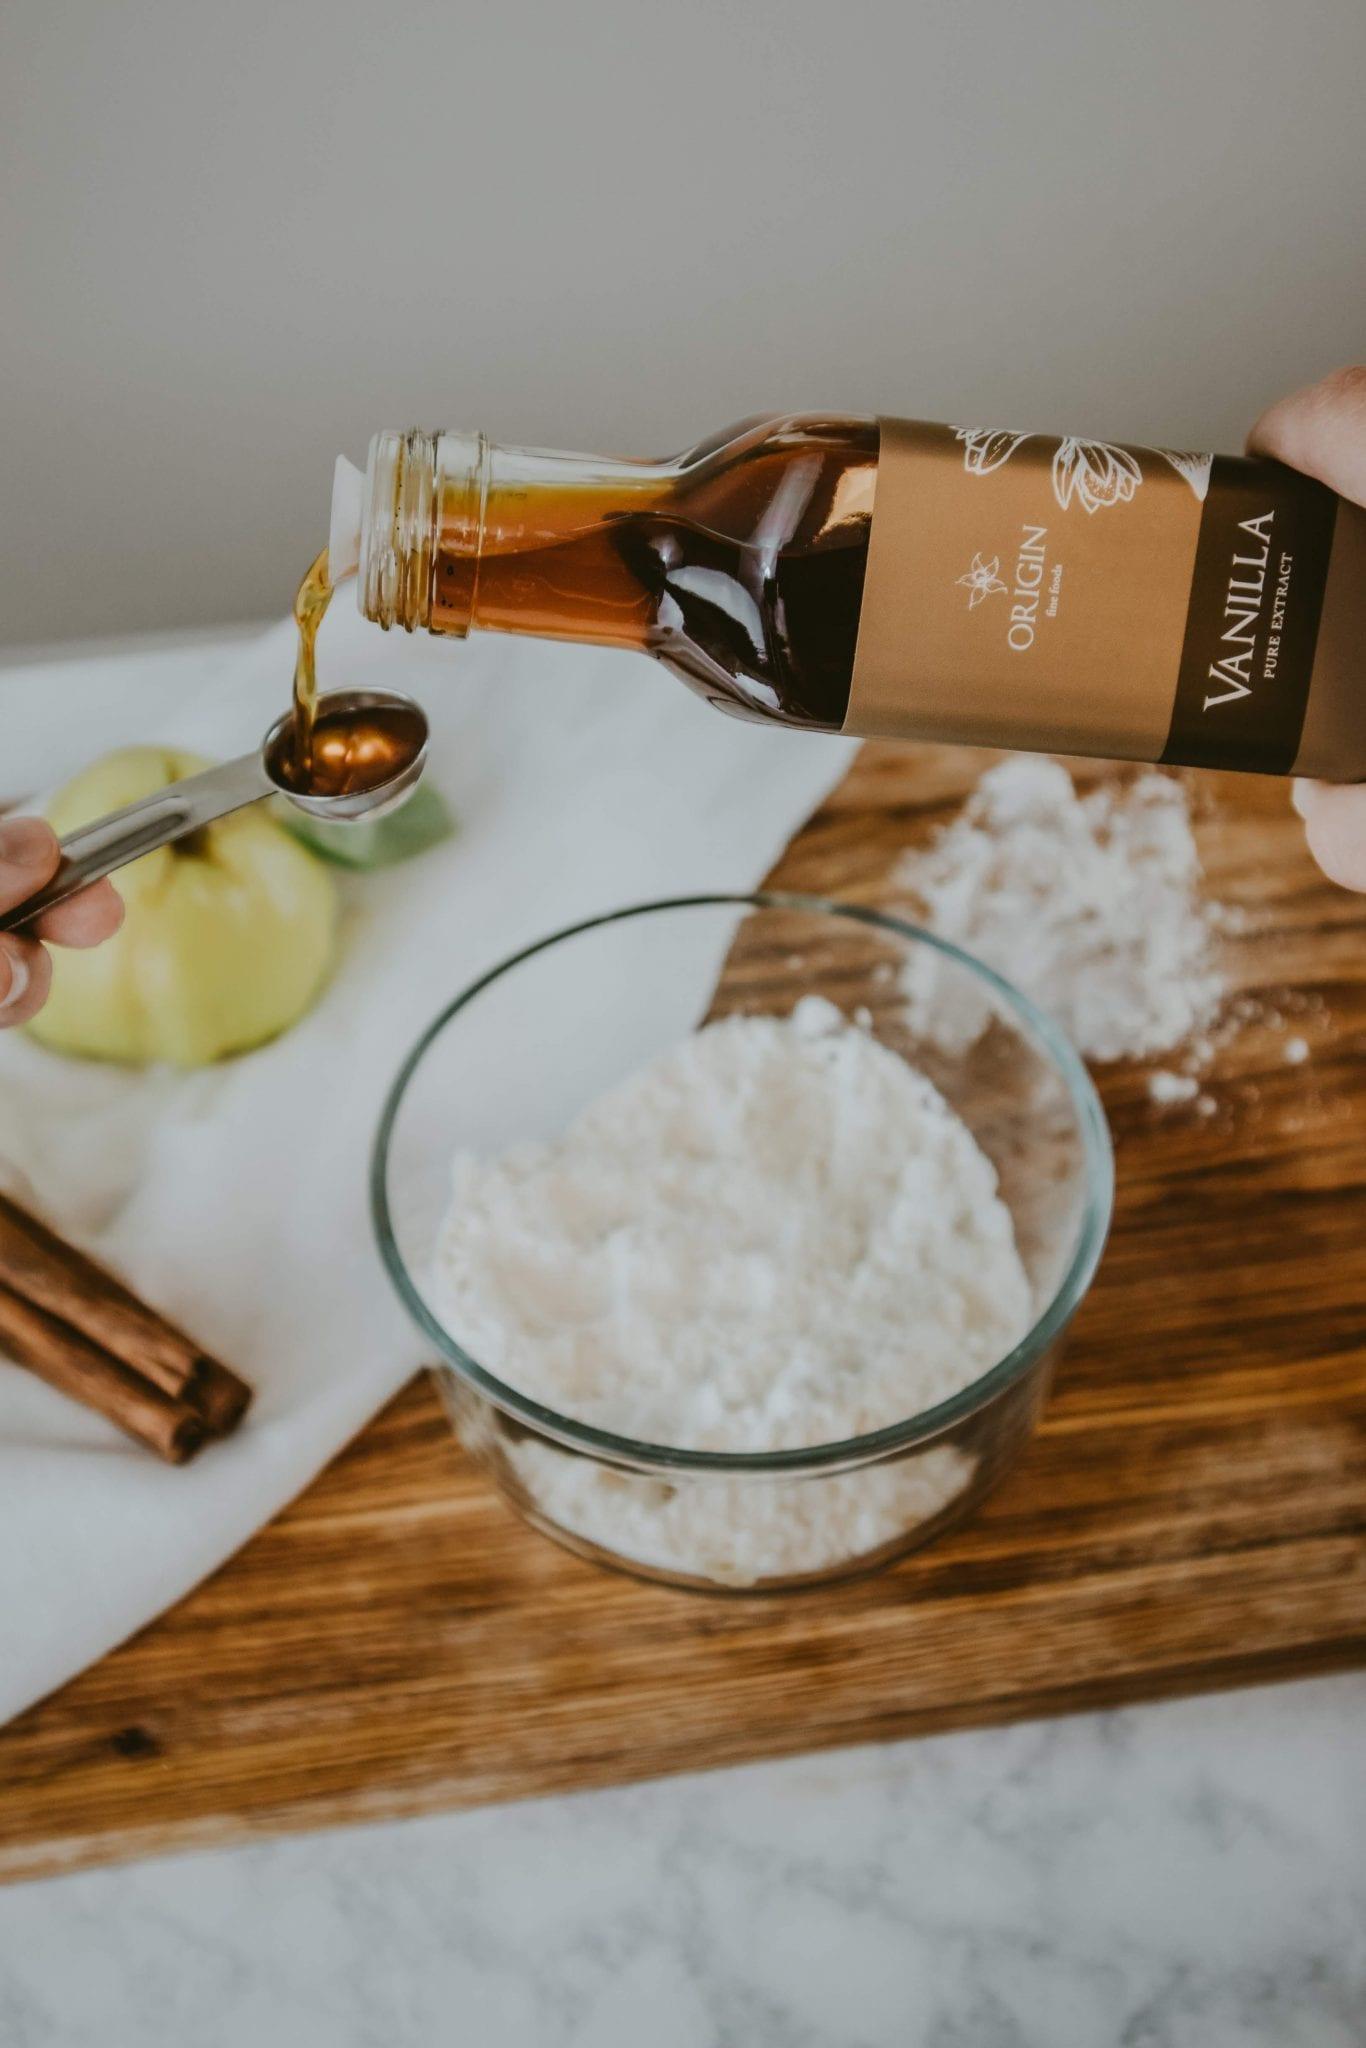 Origin Vanilla Full Extract Bottle Cooking